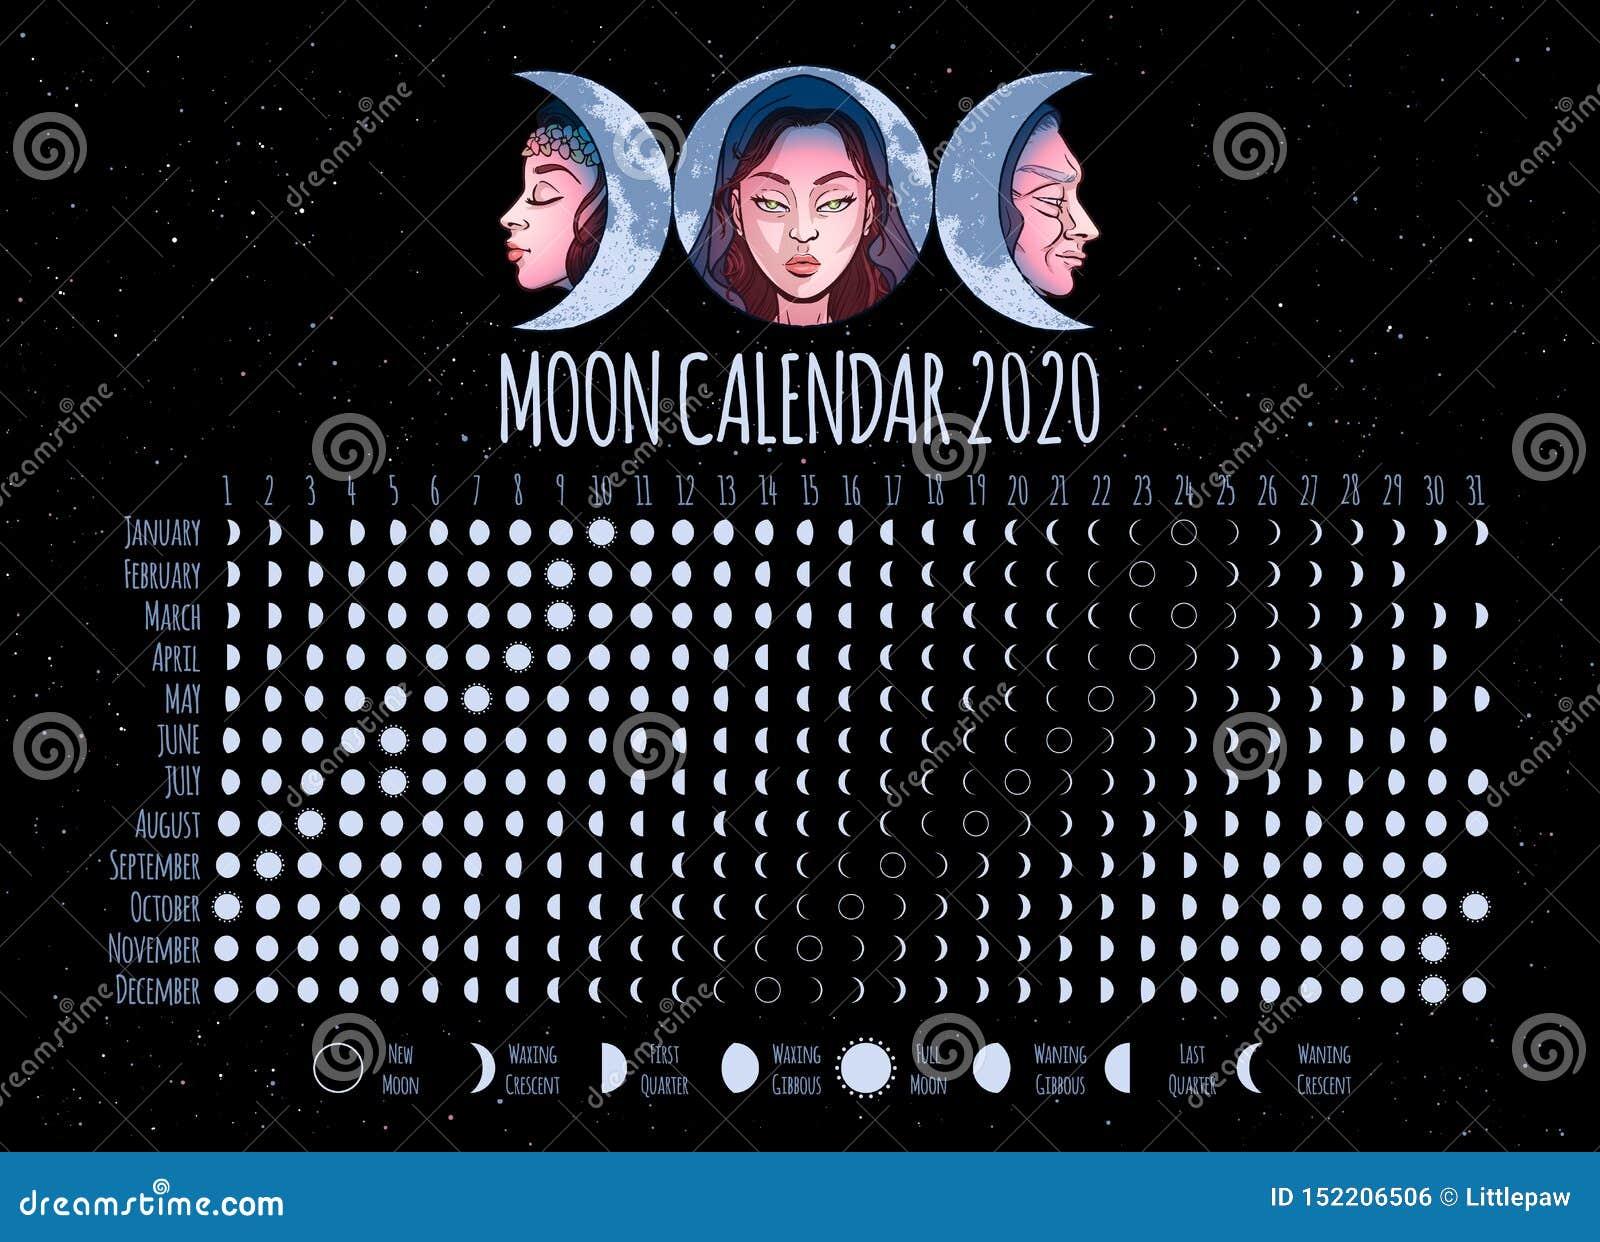 Calendrier Lune 2020.Calendrier De Lune 2020 Ans Phases Lunaires Cycles